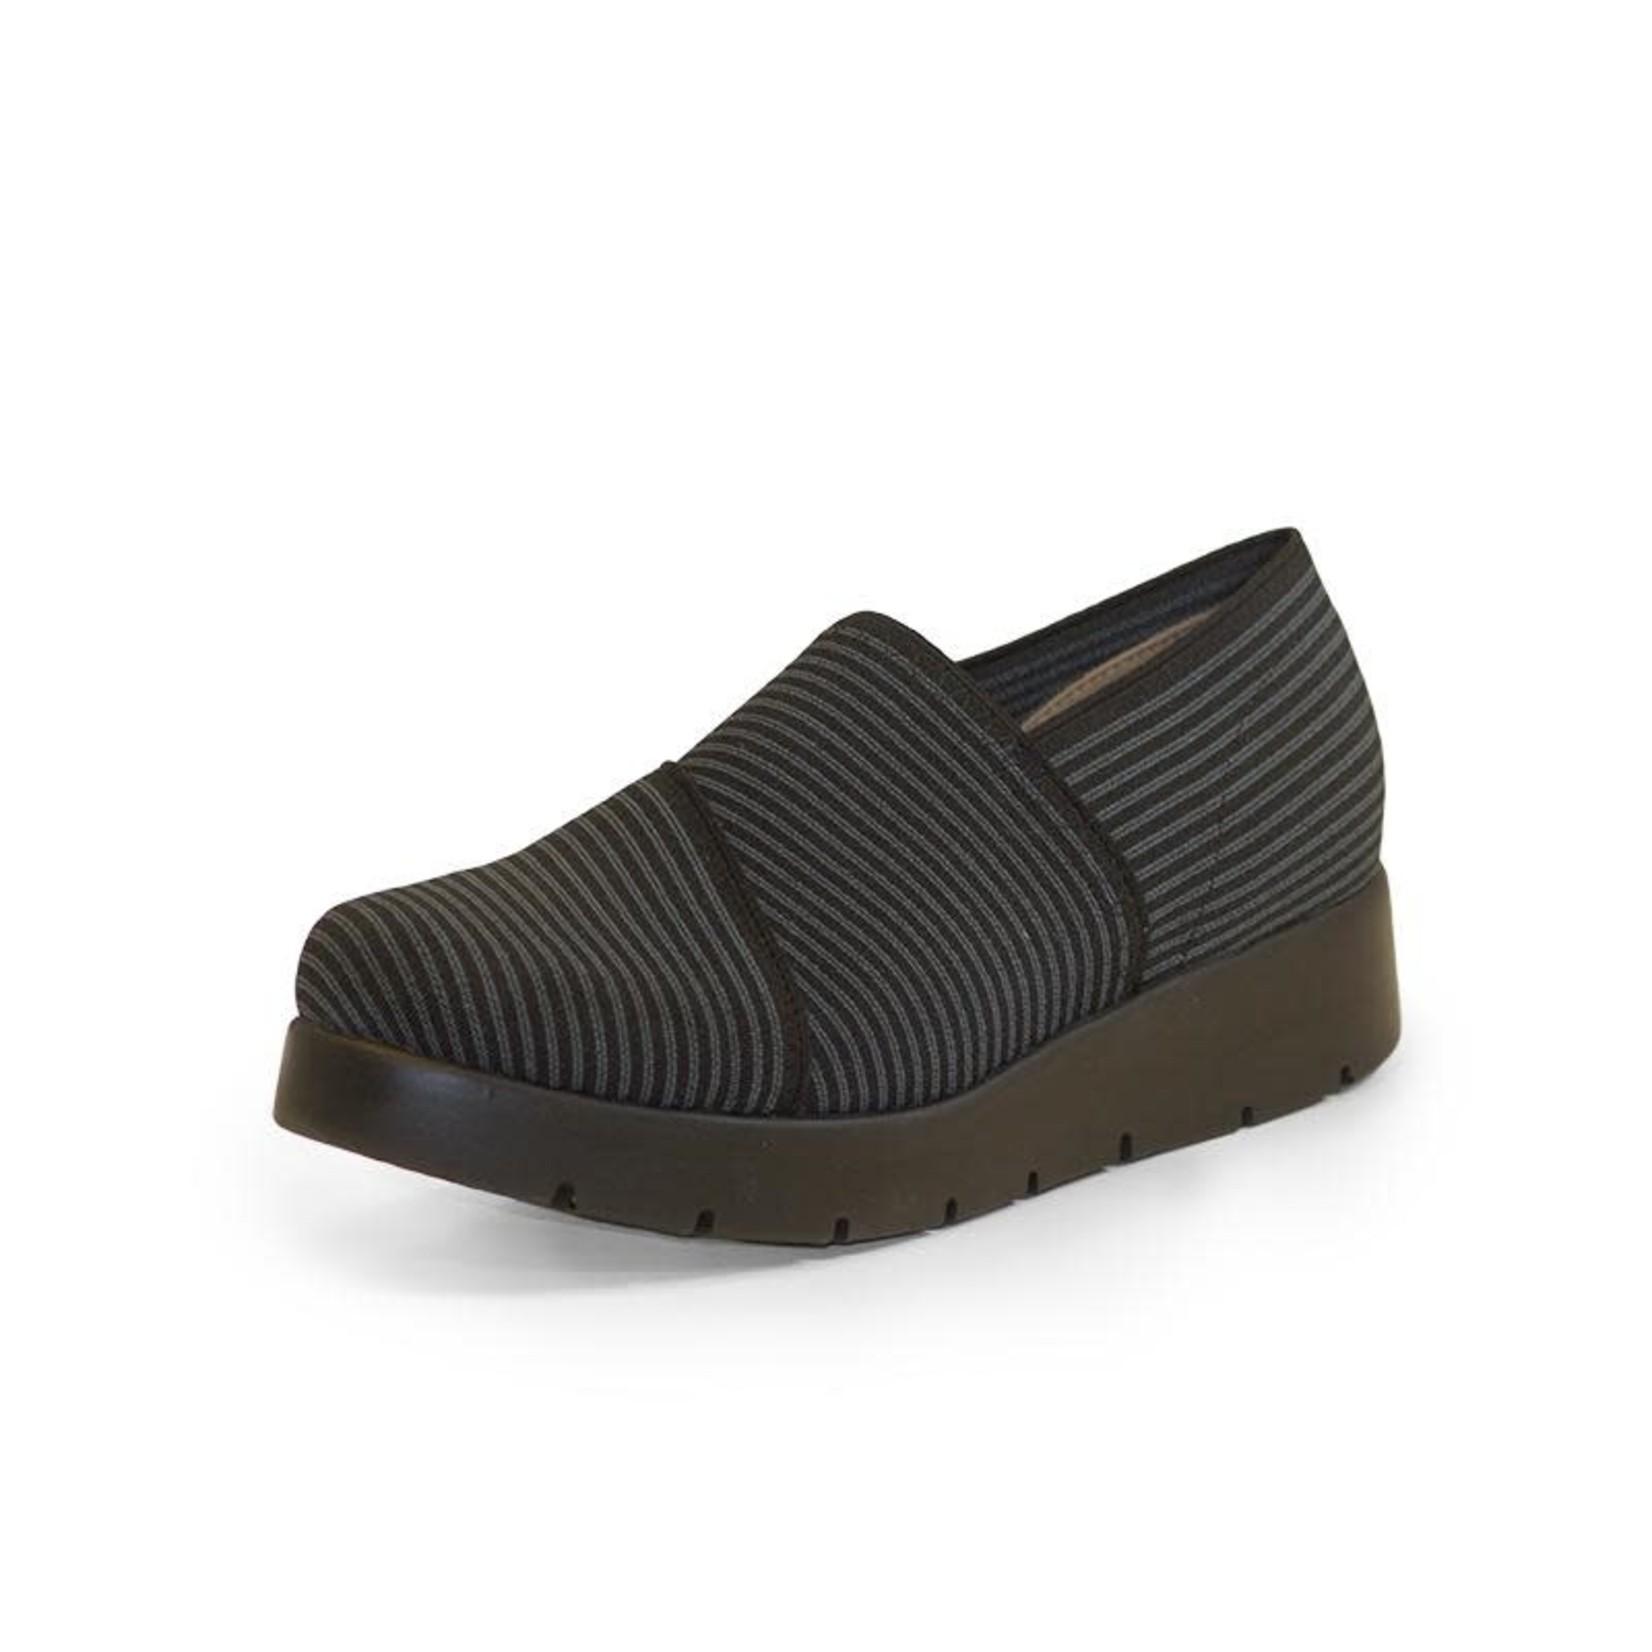 Milly Shoe in Gray Pin Stripe 7